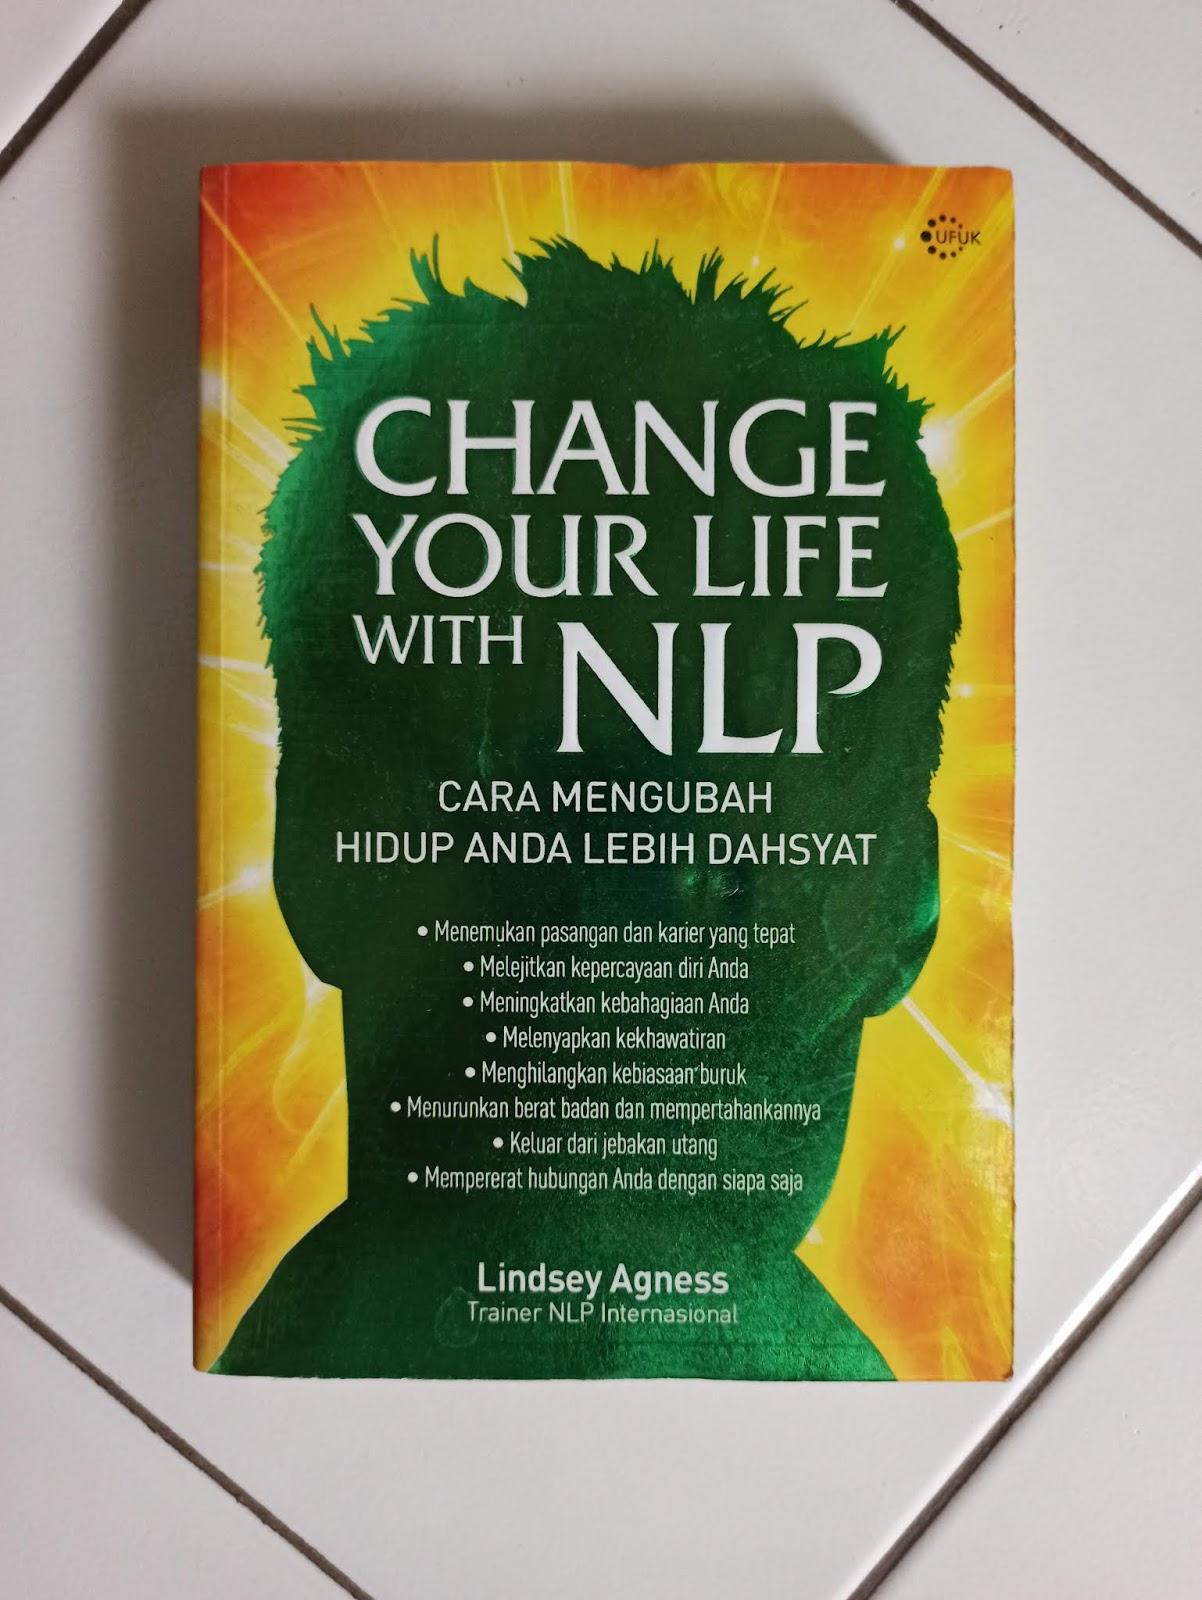 Cara Mengubah Hidup Anda Lebih Dahsyat